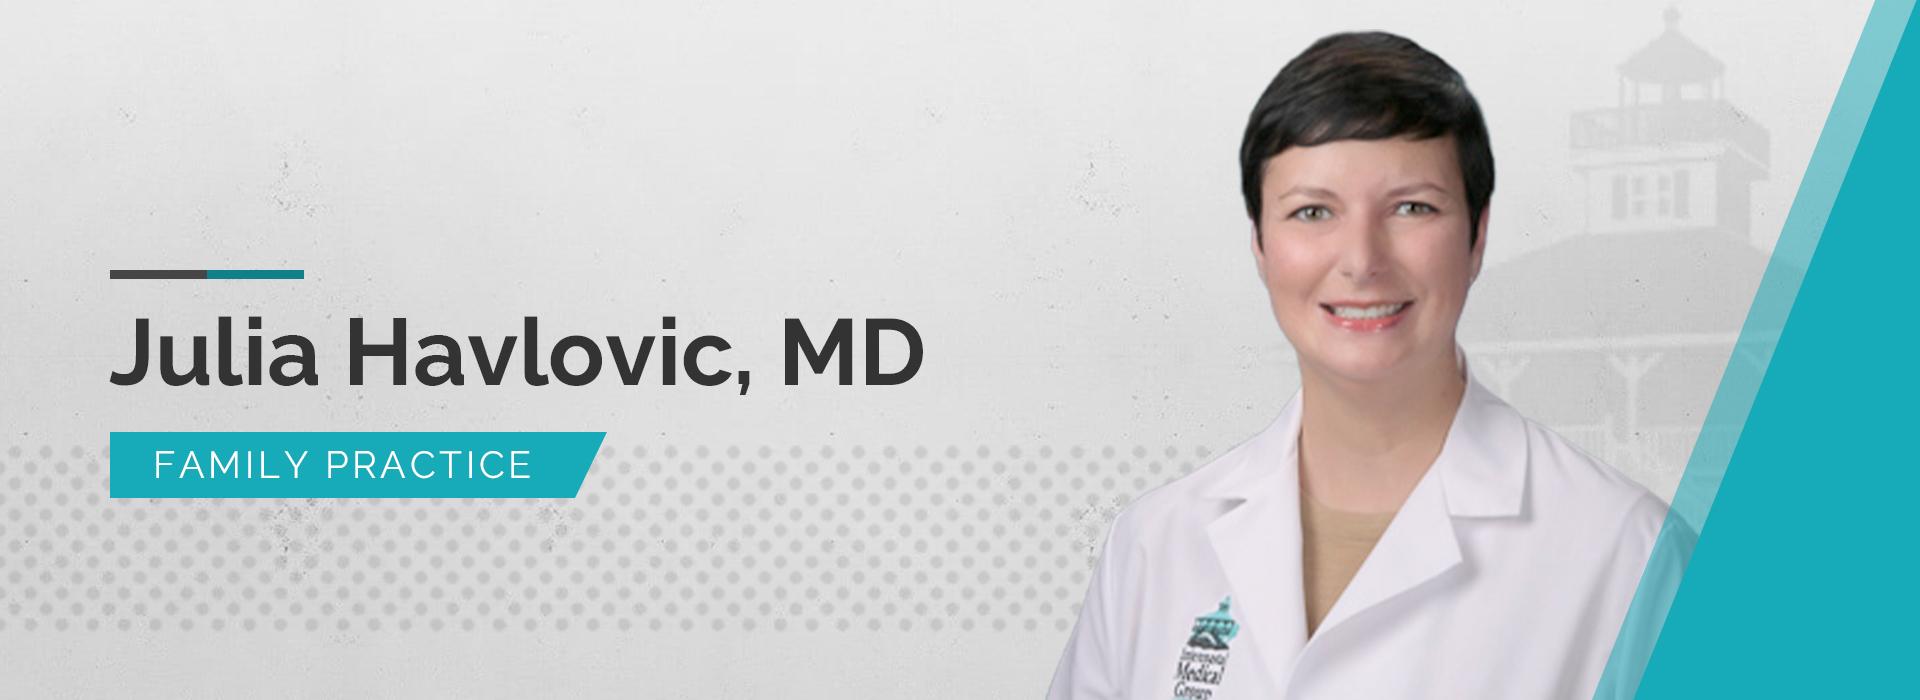 Intercoastal Medical Group